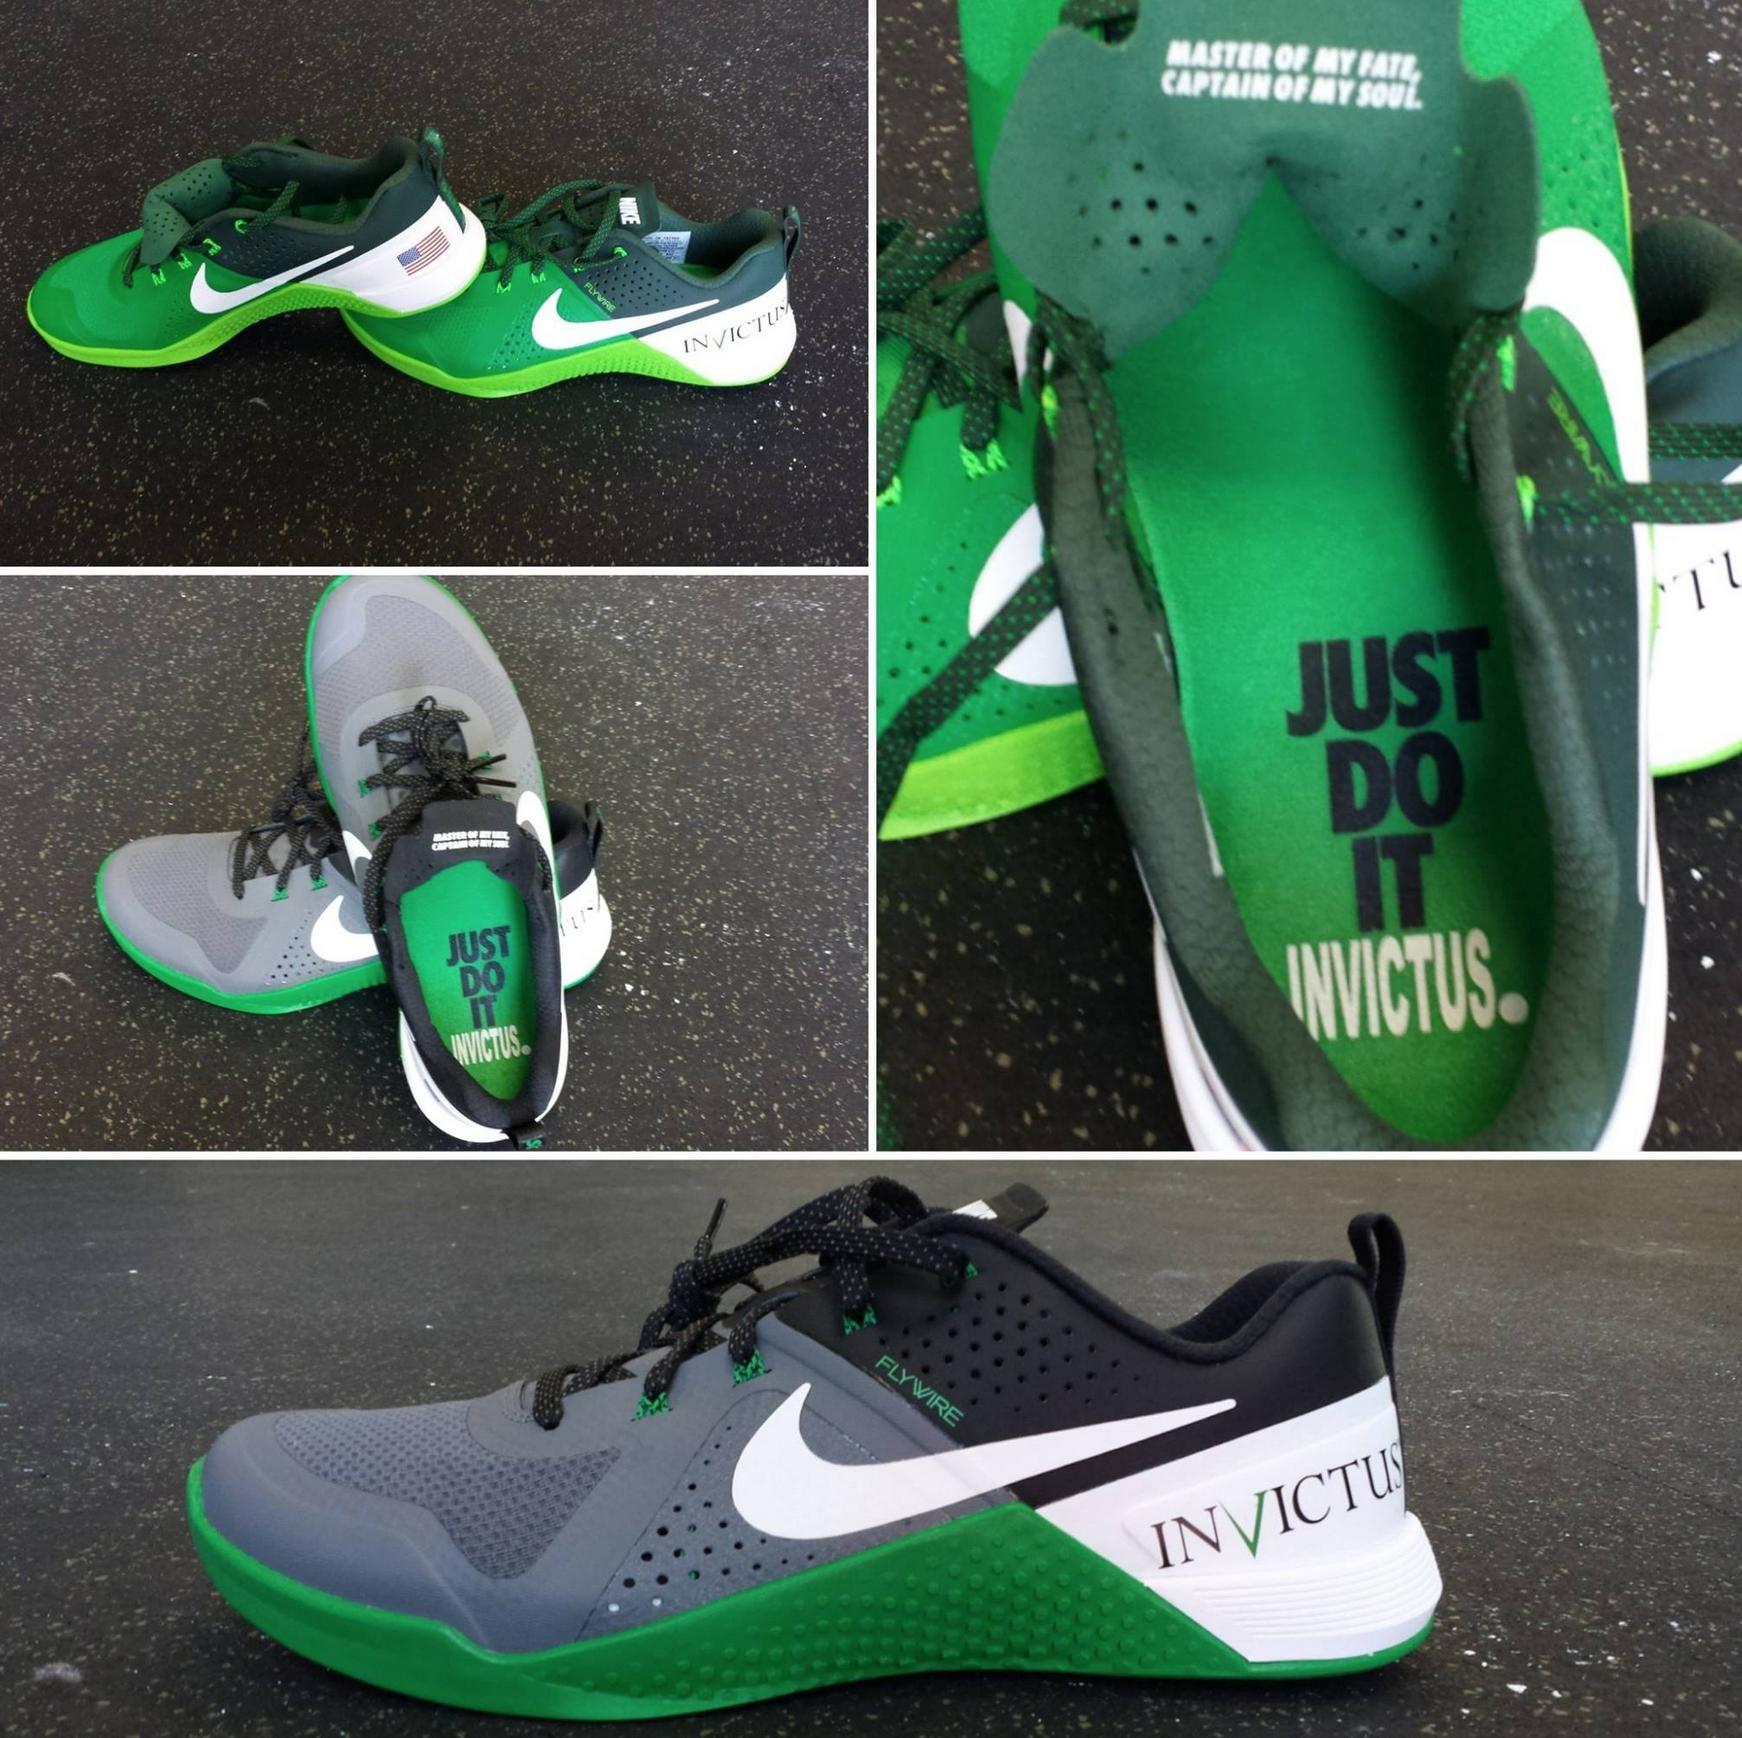 New Men\u0027s Nike Metcon 1 Training Running Shoes Black 704688 001 Size 9.5